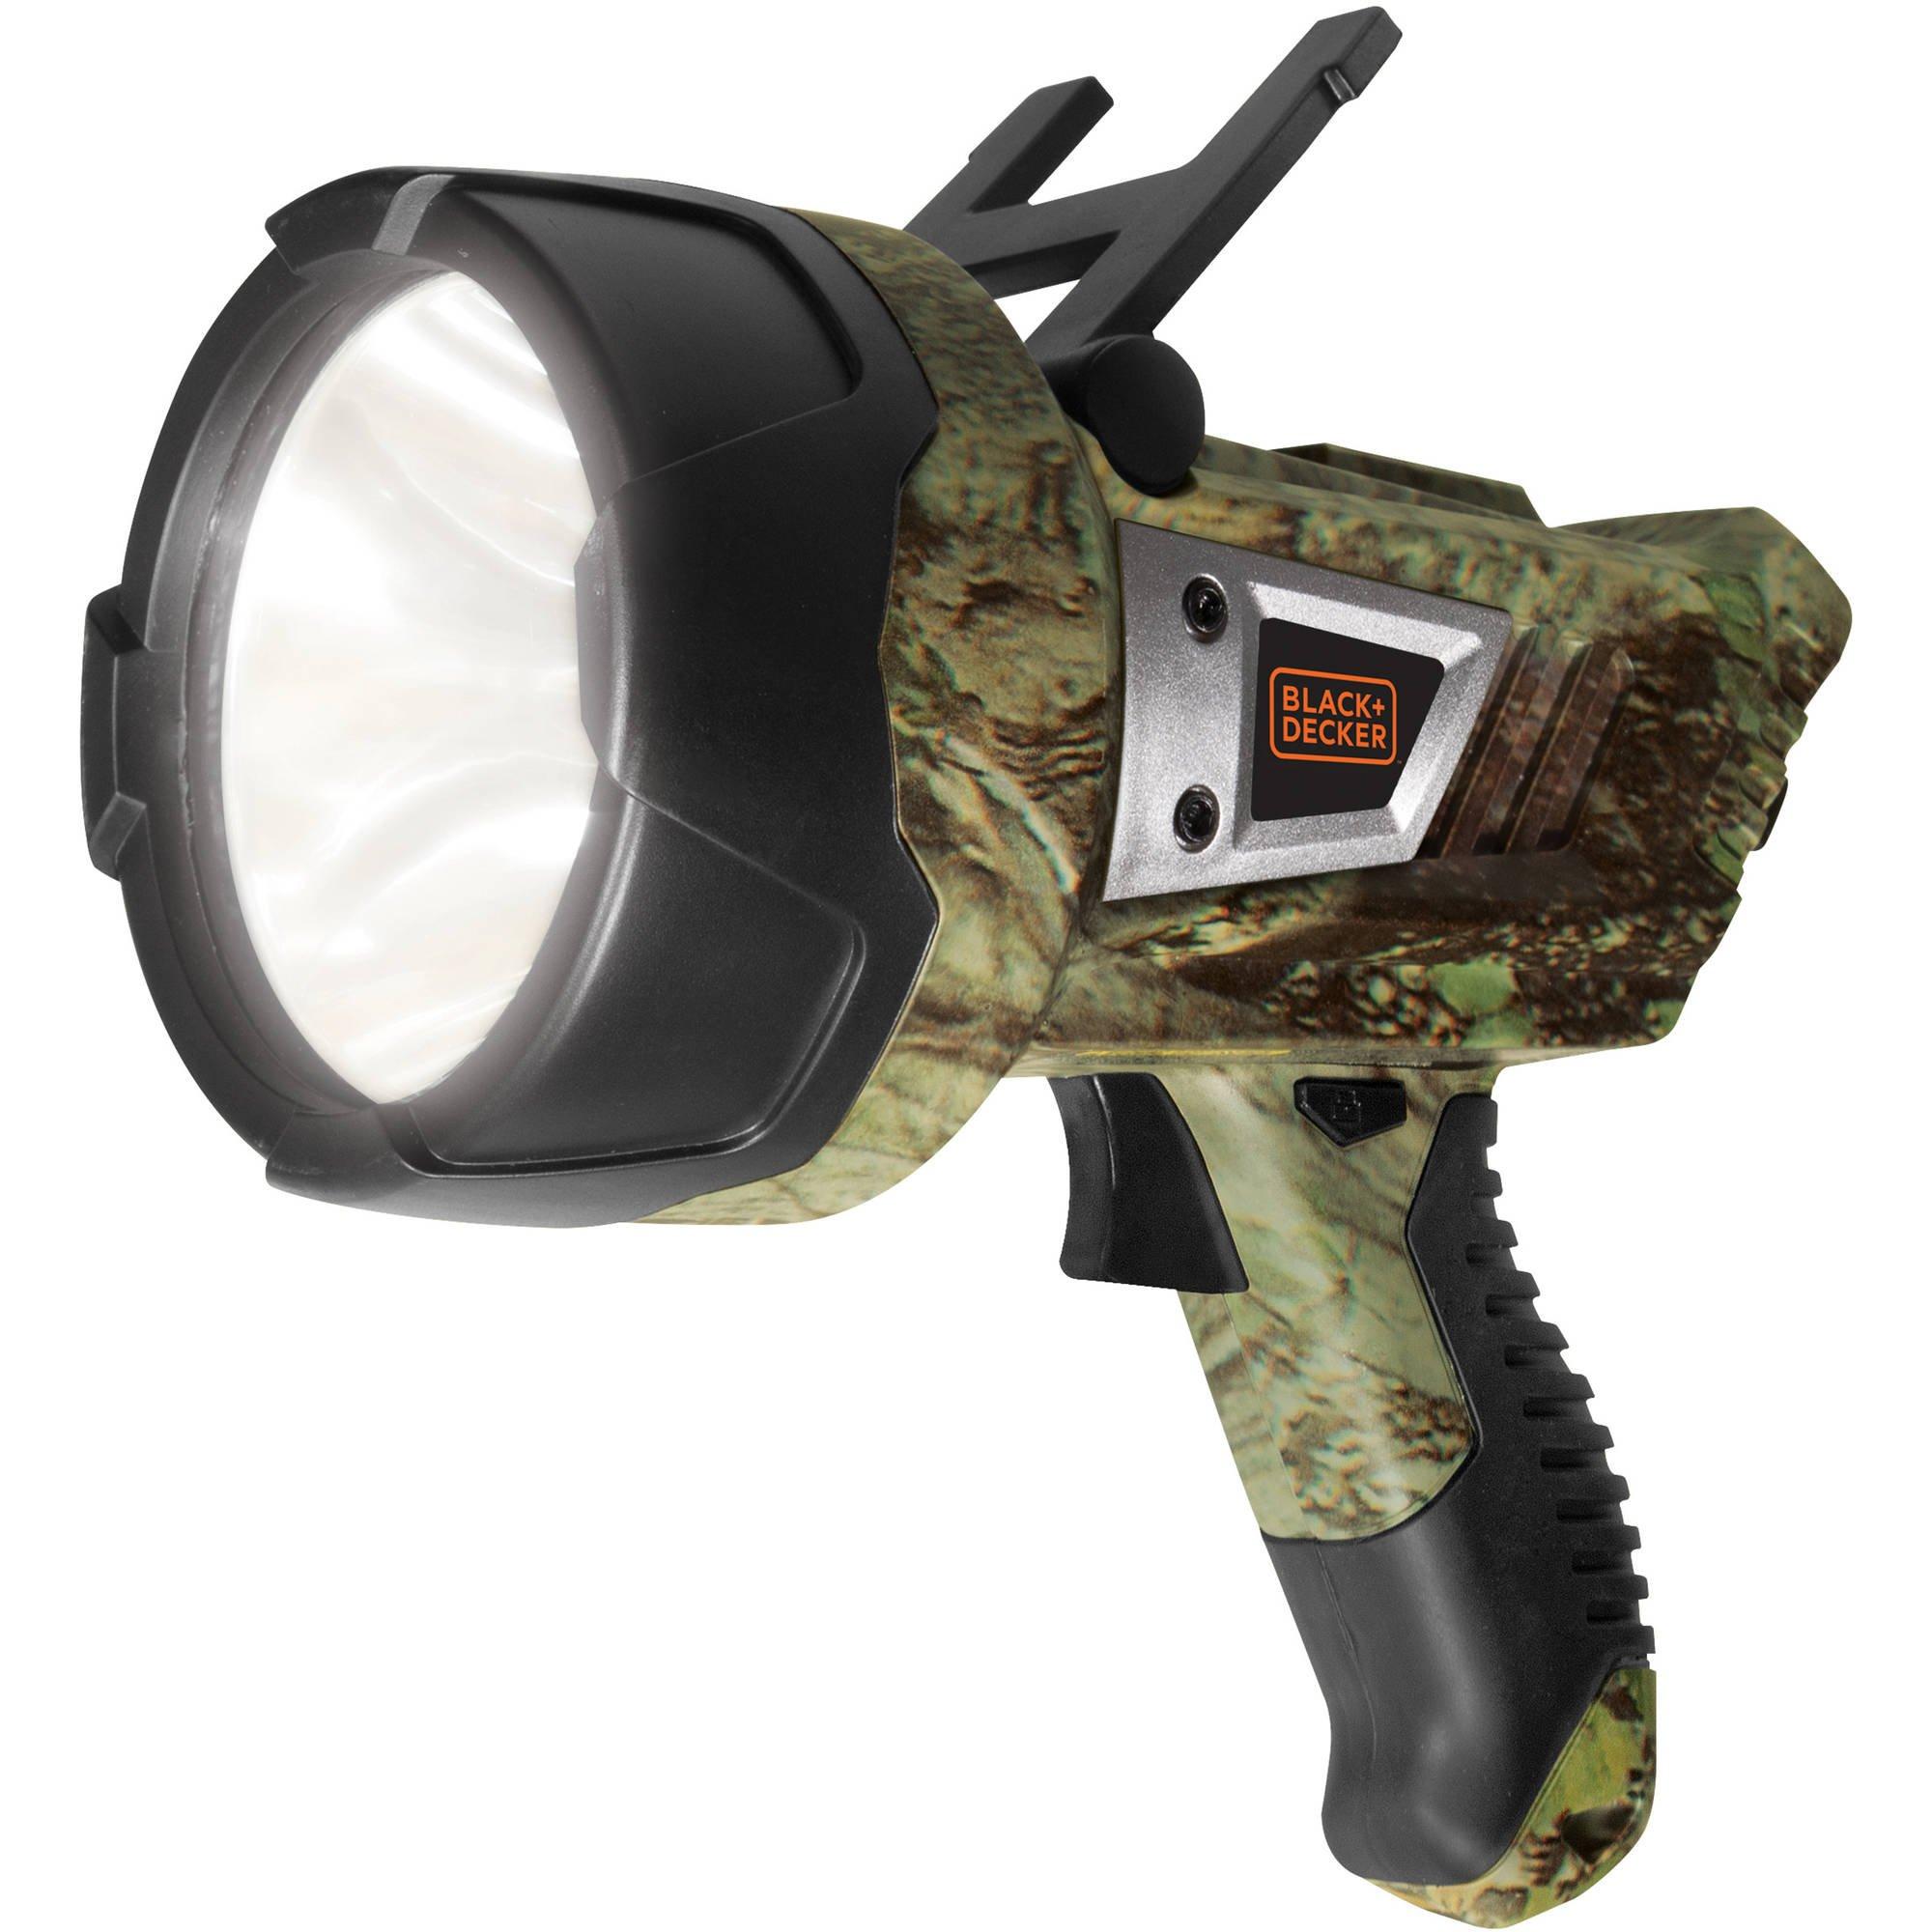 Lithium LED Spotlight, Camo